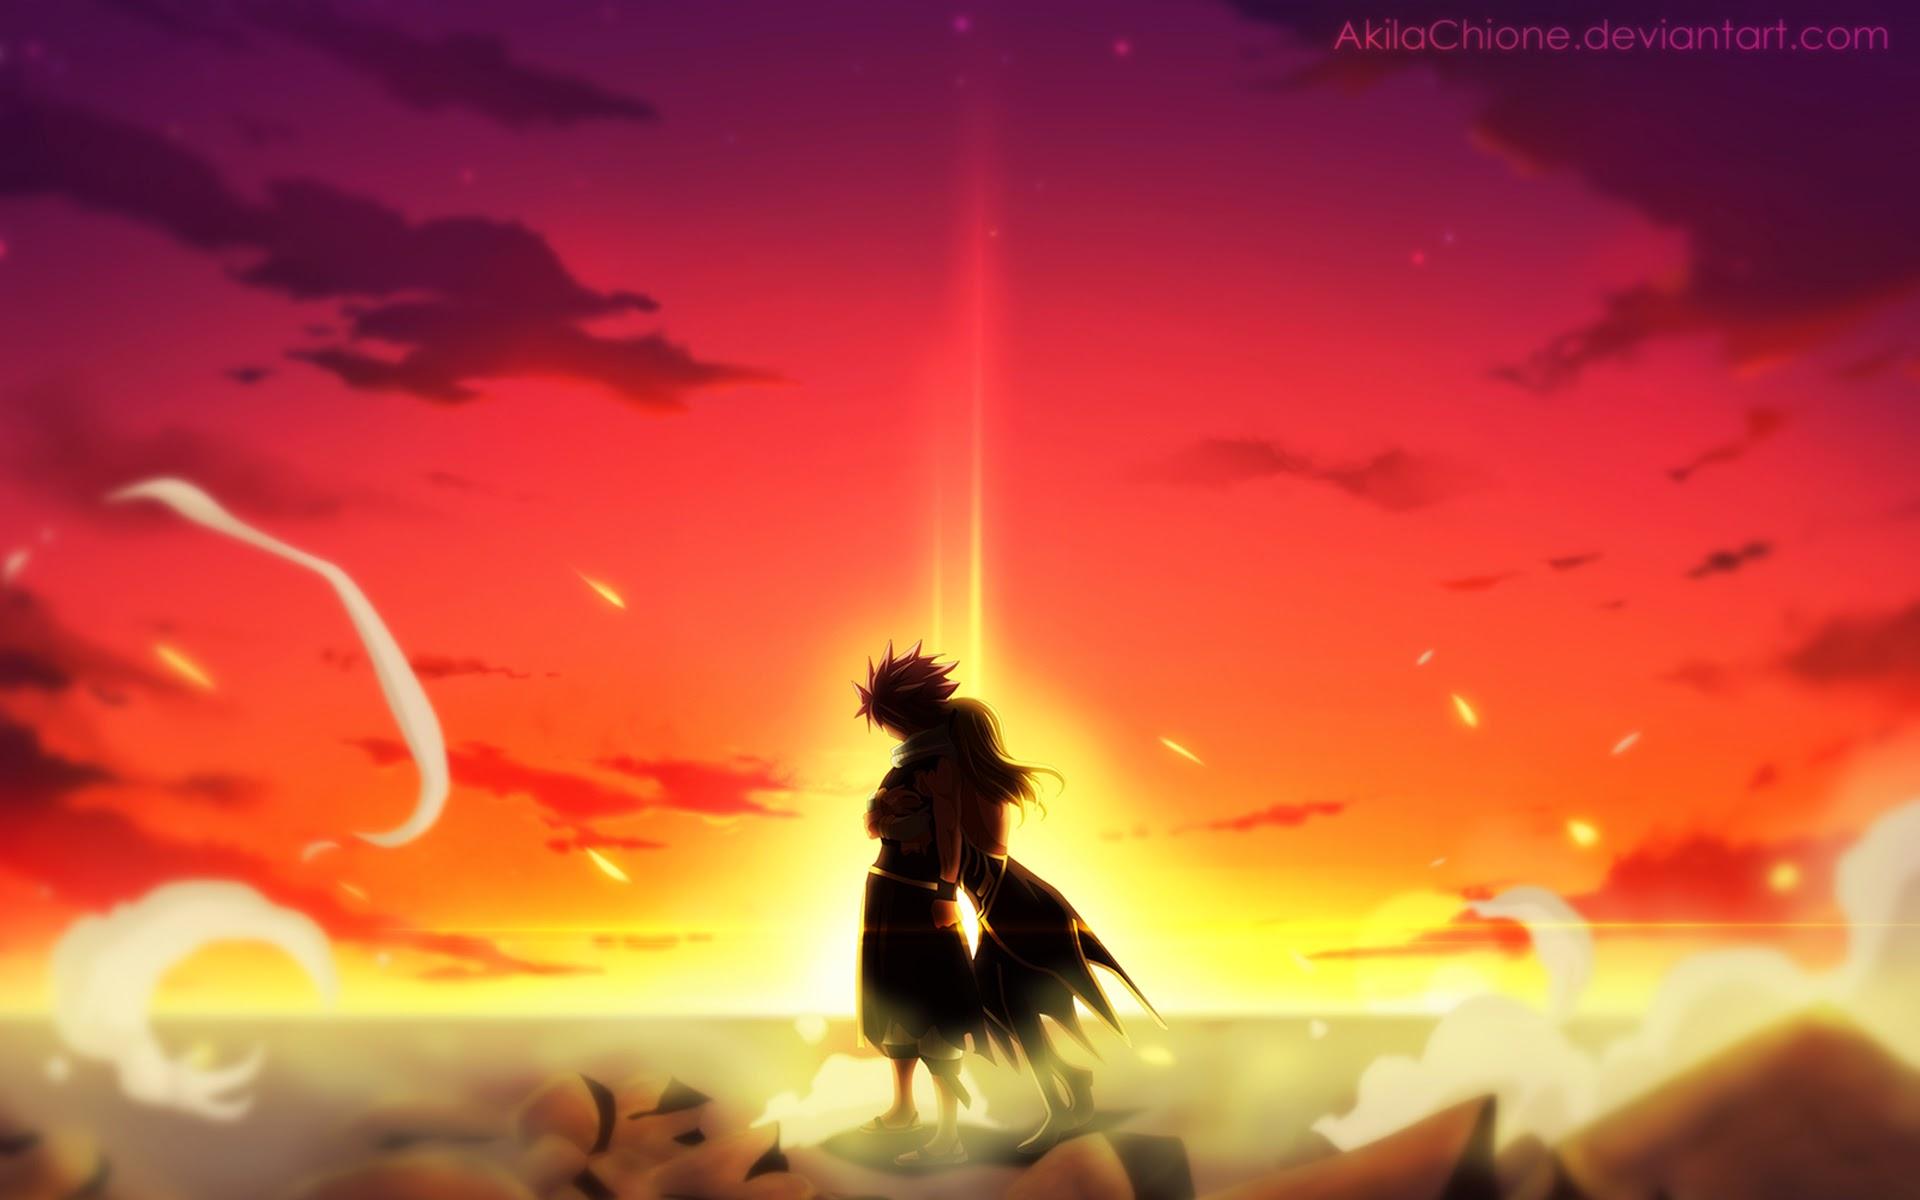 natsu lucy hug sunset fairy tail anime hd wallpaper 19201200 b025 1920x1200